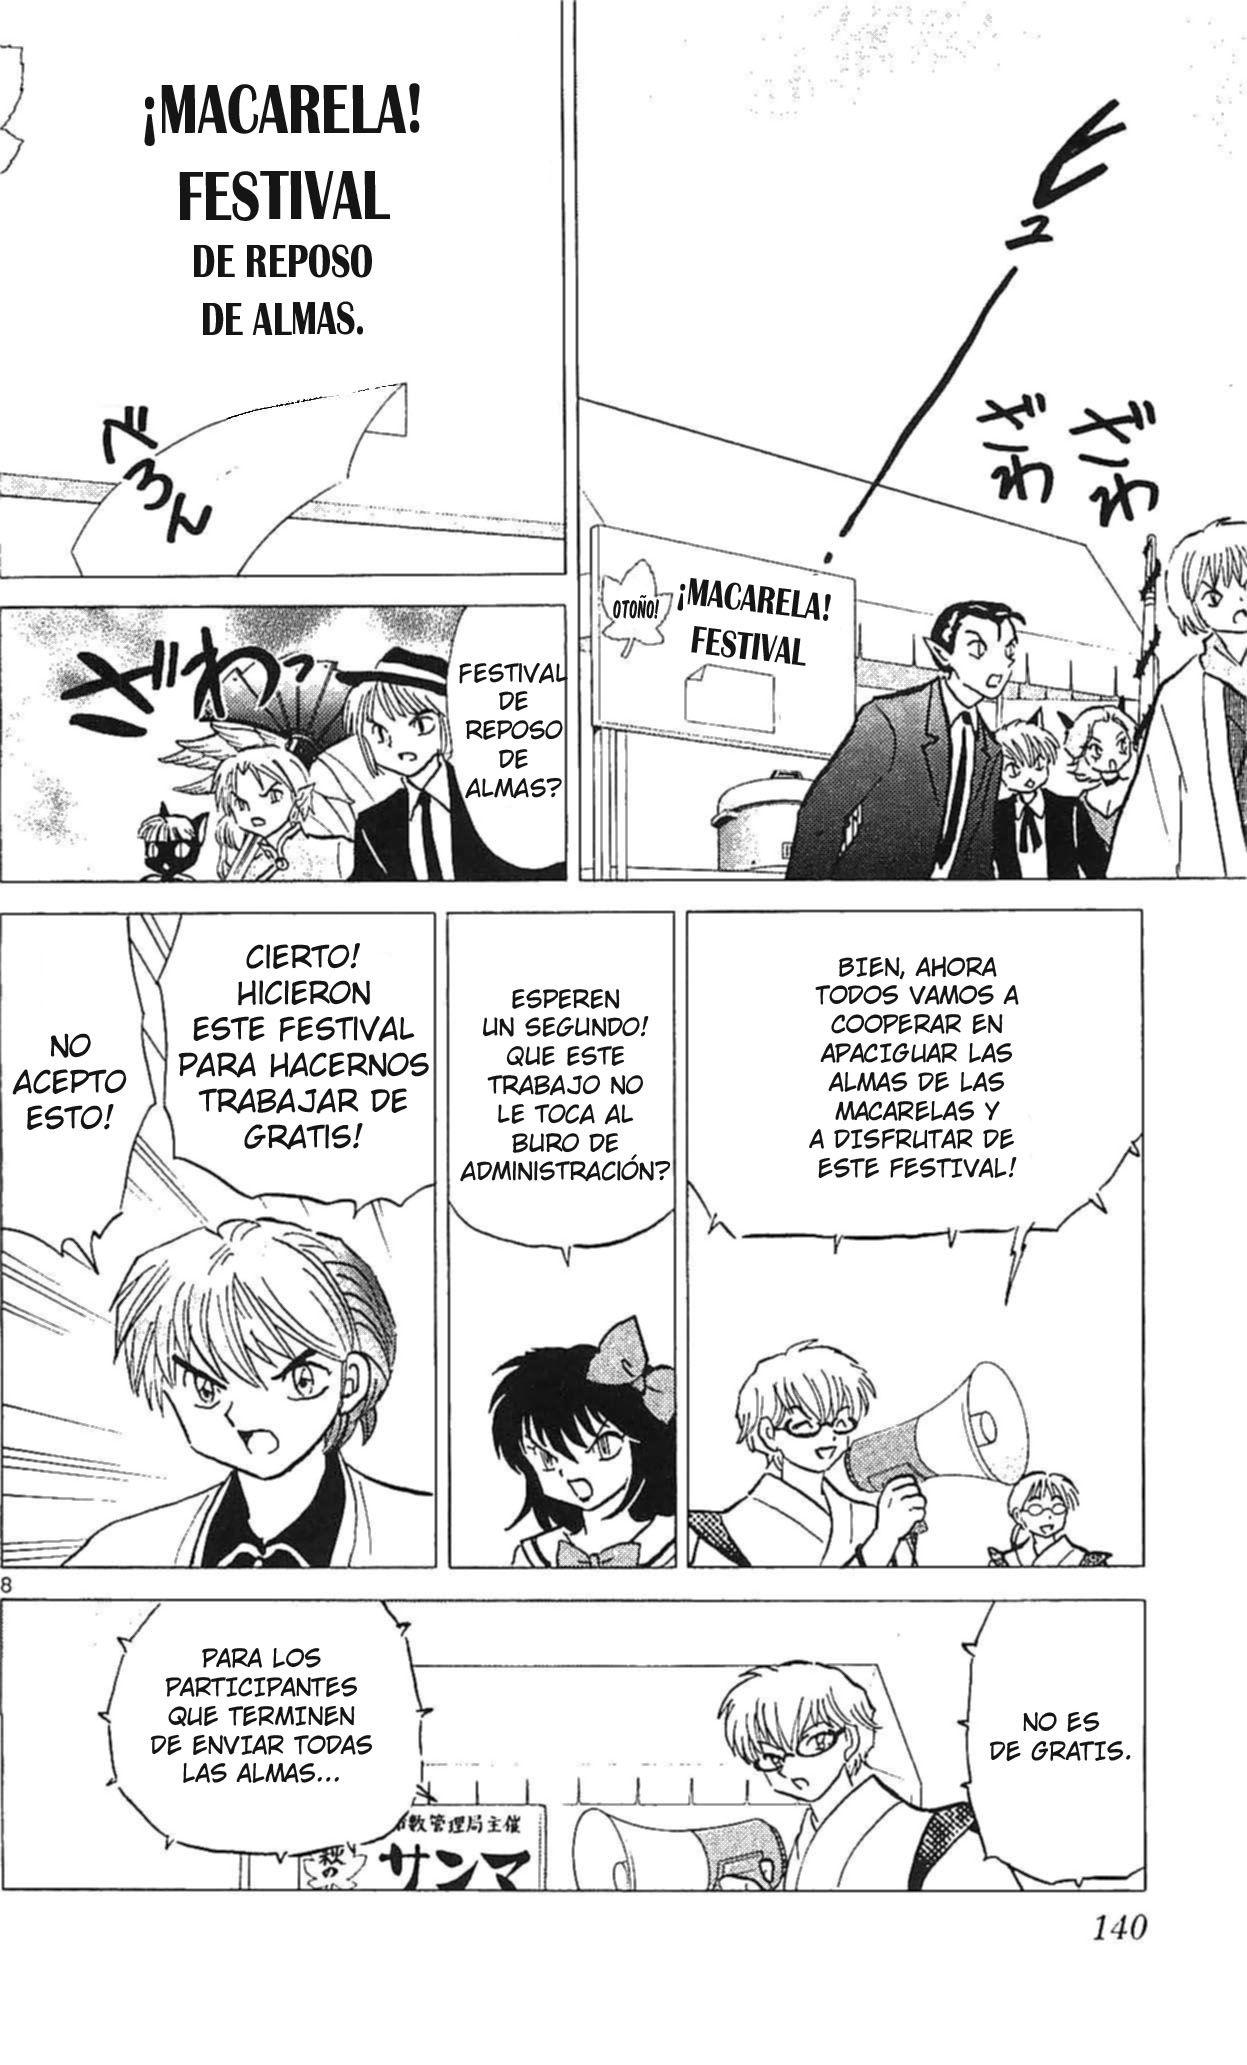 https://c5.ninemanga.com/es_manga/pic2/33/609/524733/d0f56cc15cd90a7568bd6e0319a0ddbb.jpg Page 9